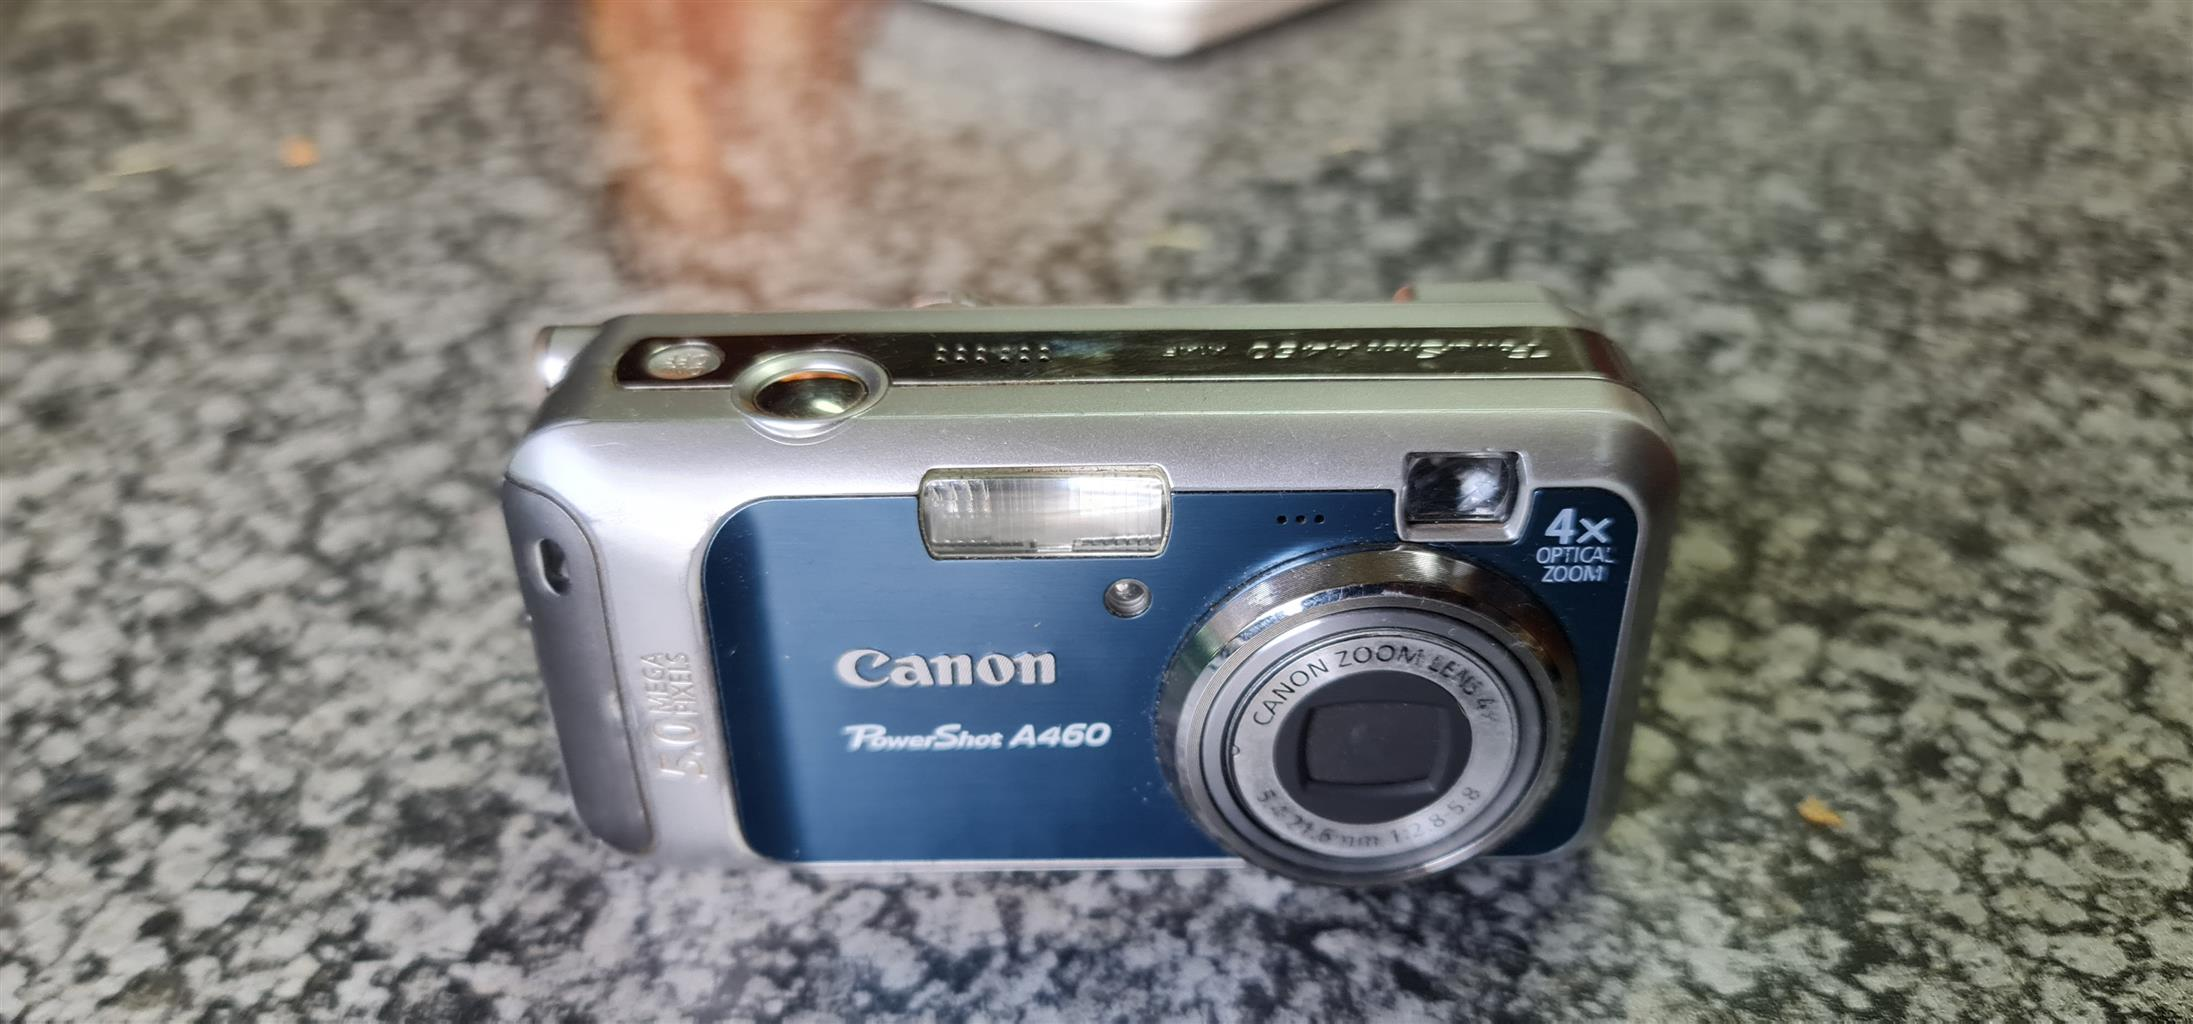 powershot a460 canon